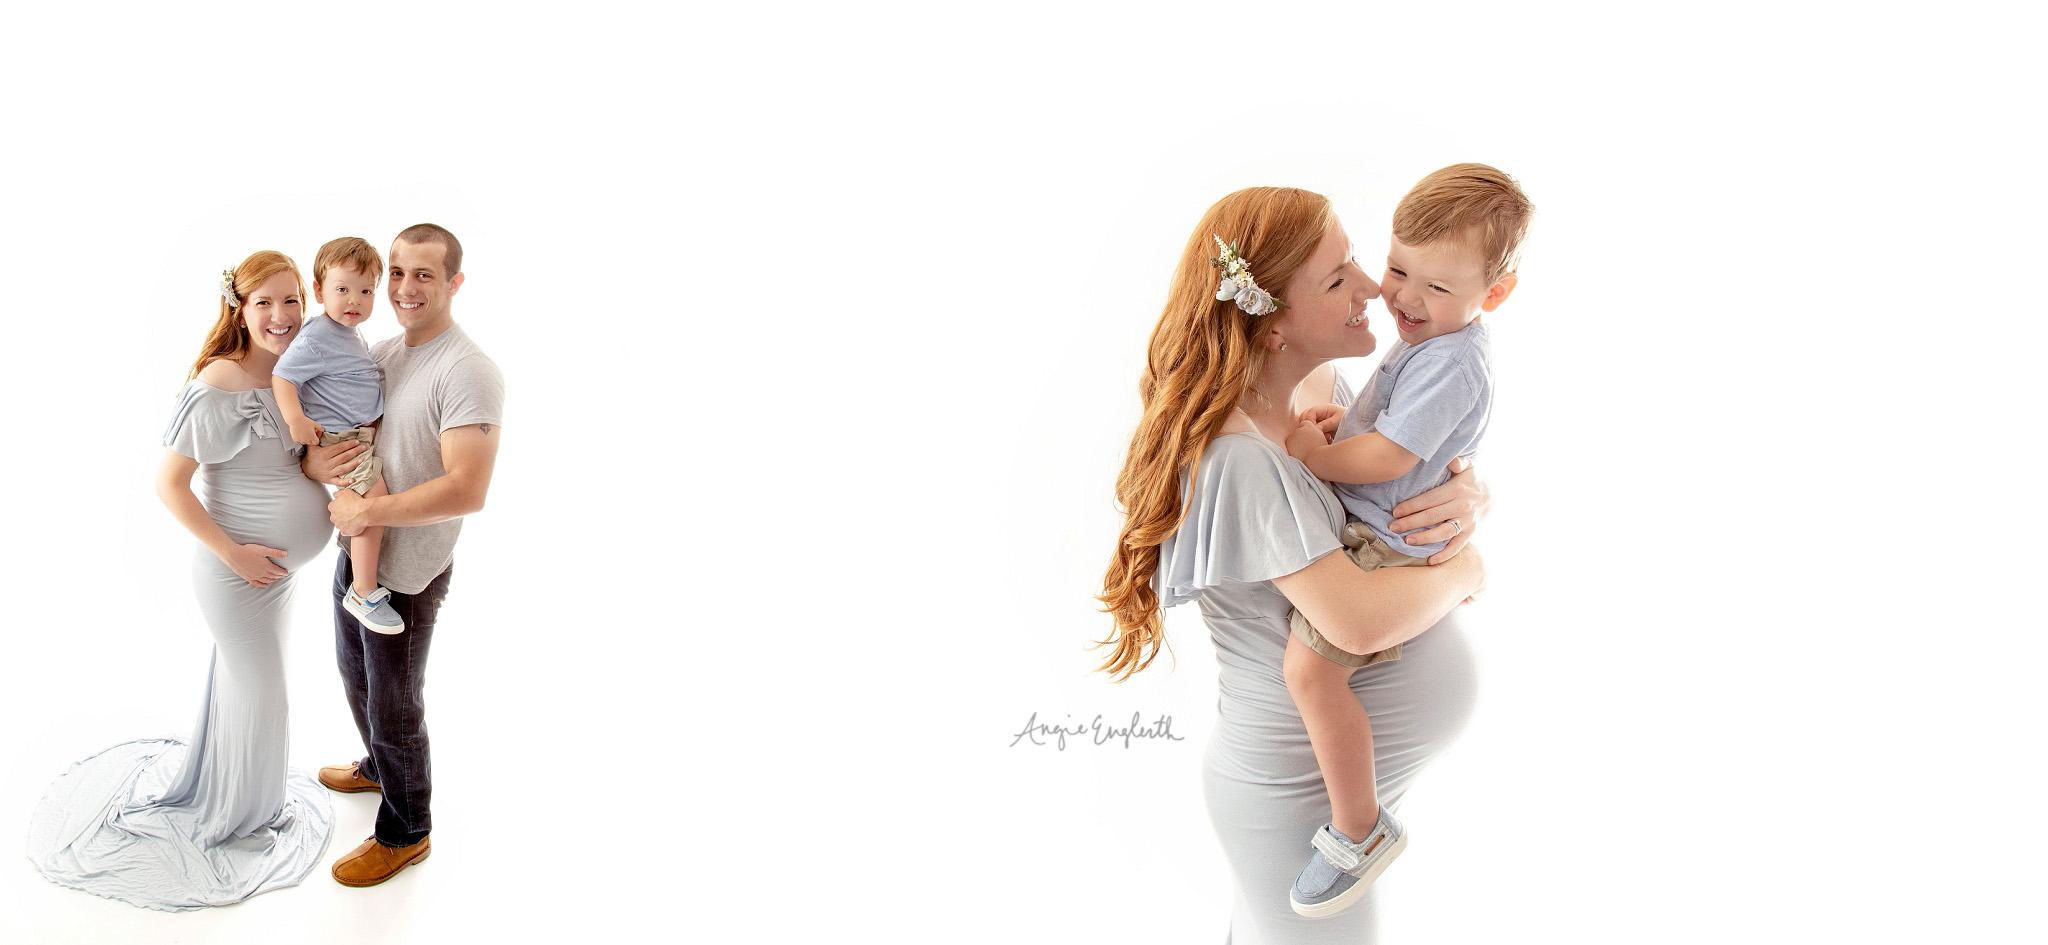 lancaster_maternity_photographer_angie_englerth_central_pa_b063.jpg